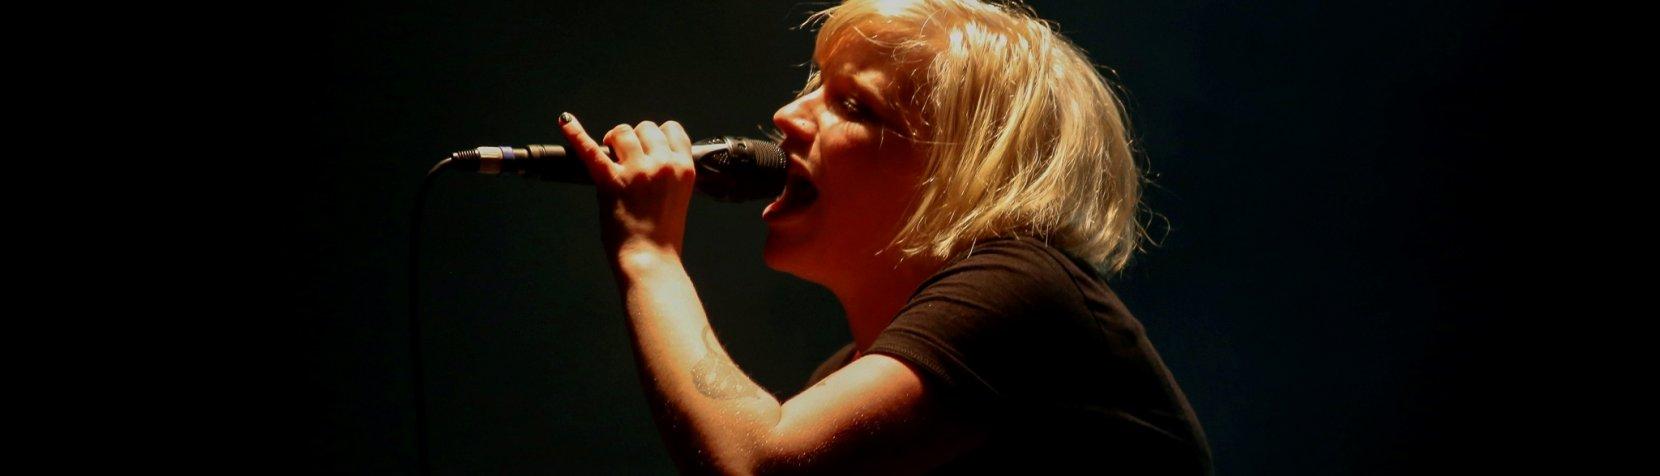 Katinka - Foto: Morten Hermansen